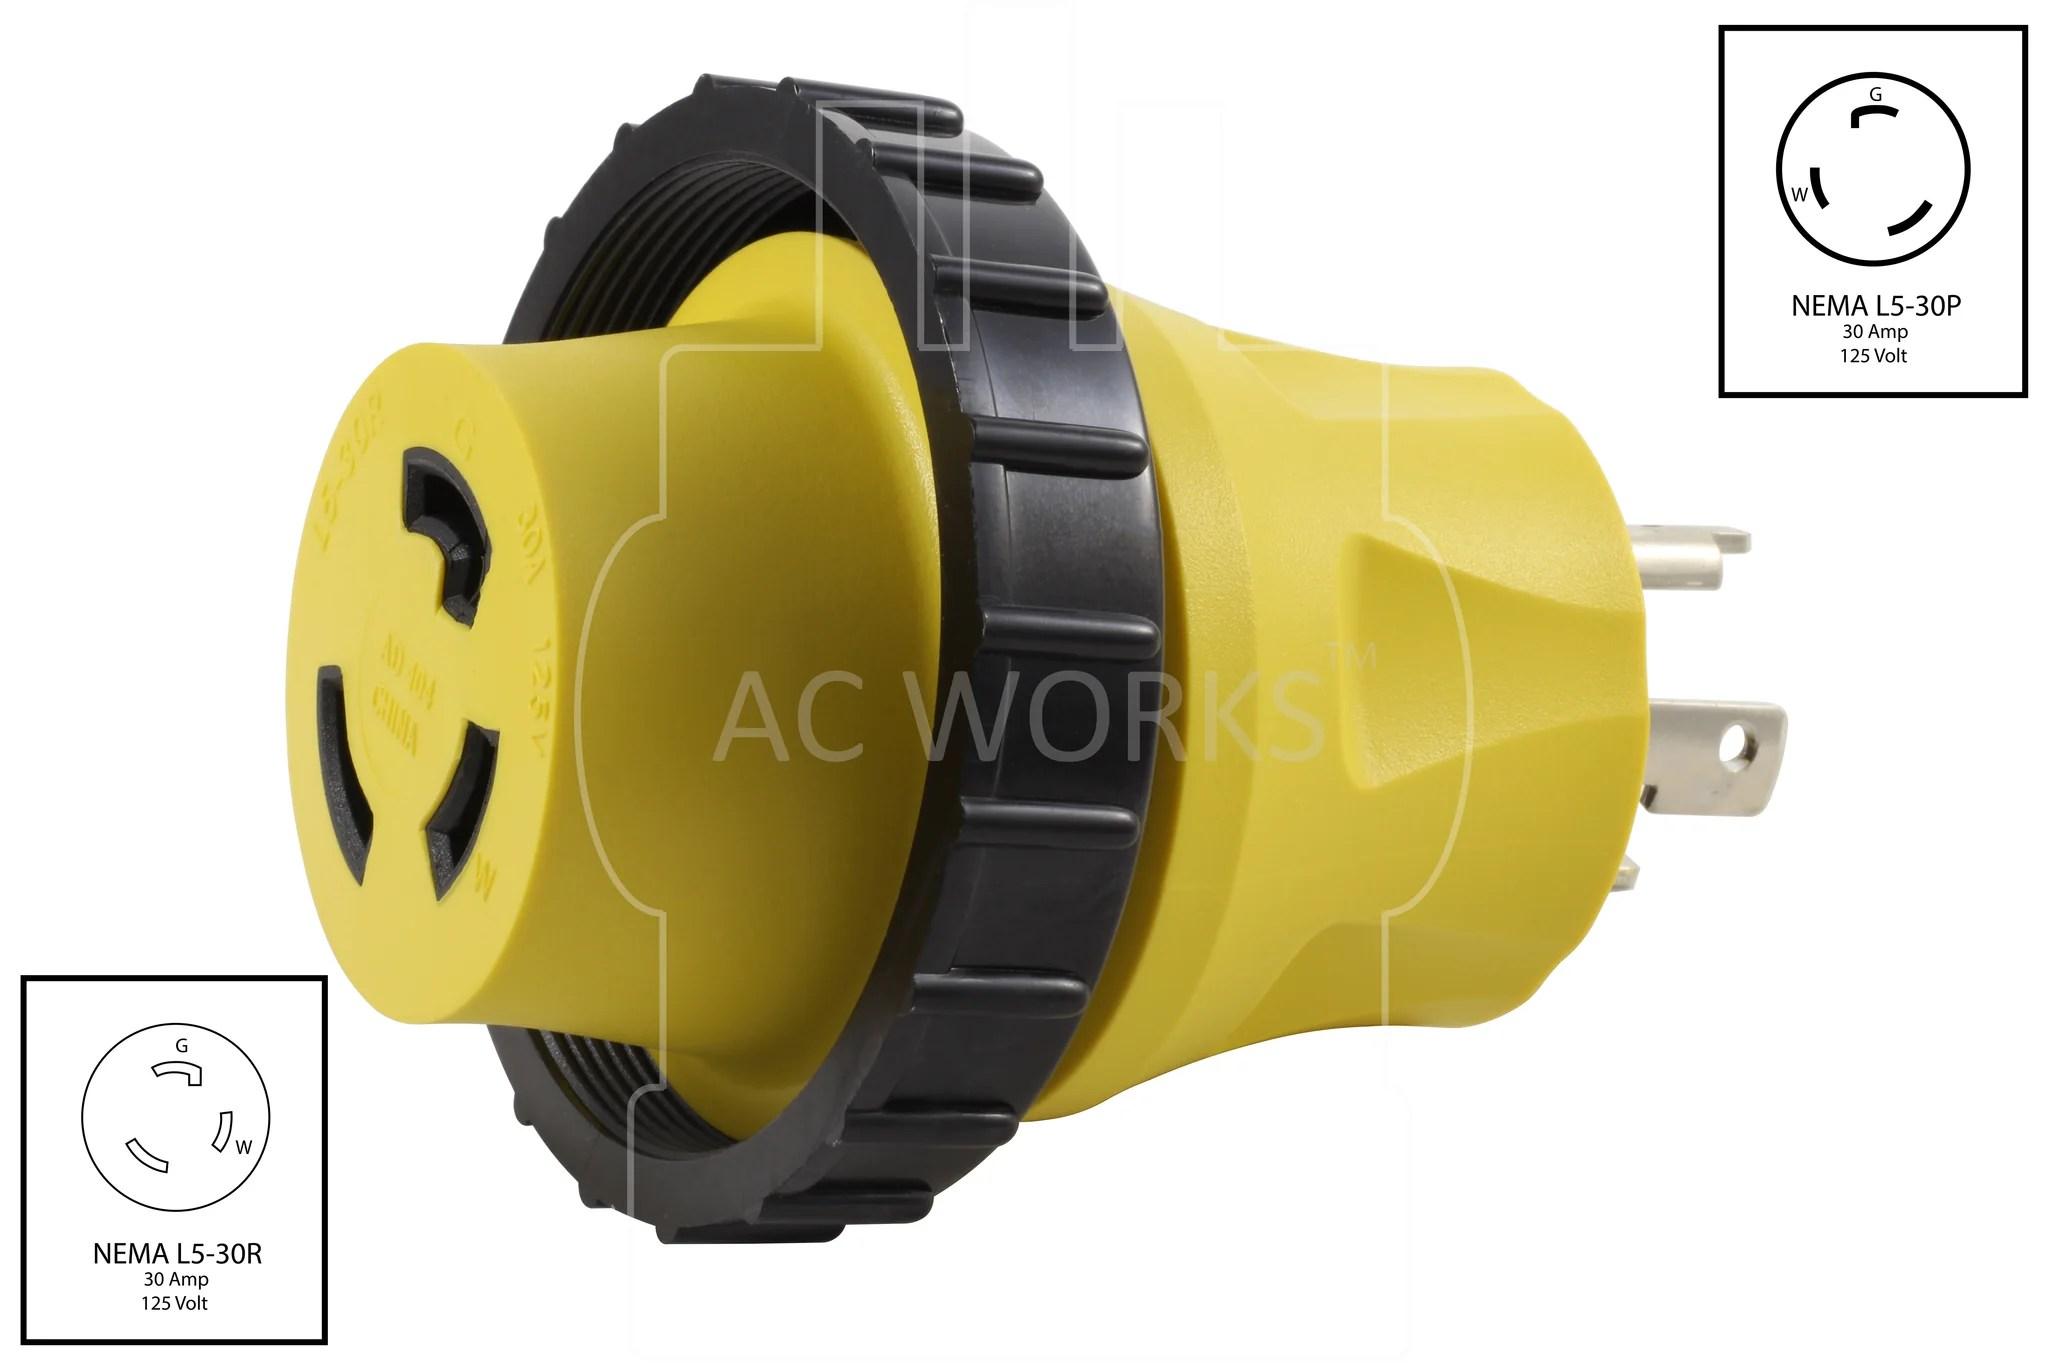 l5 30p wiring ac plug wiring diagrams ac works rv marine adapter 30a locking plug [ 2048 x 1365 Pixel ]